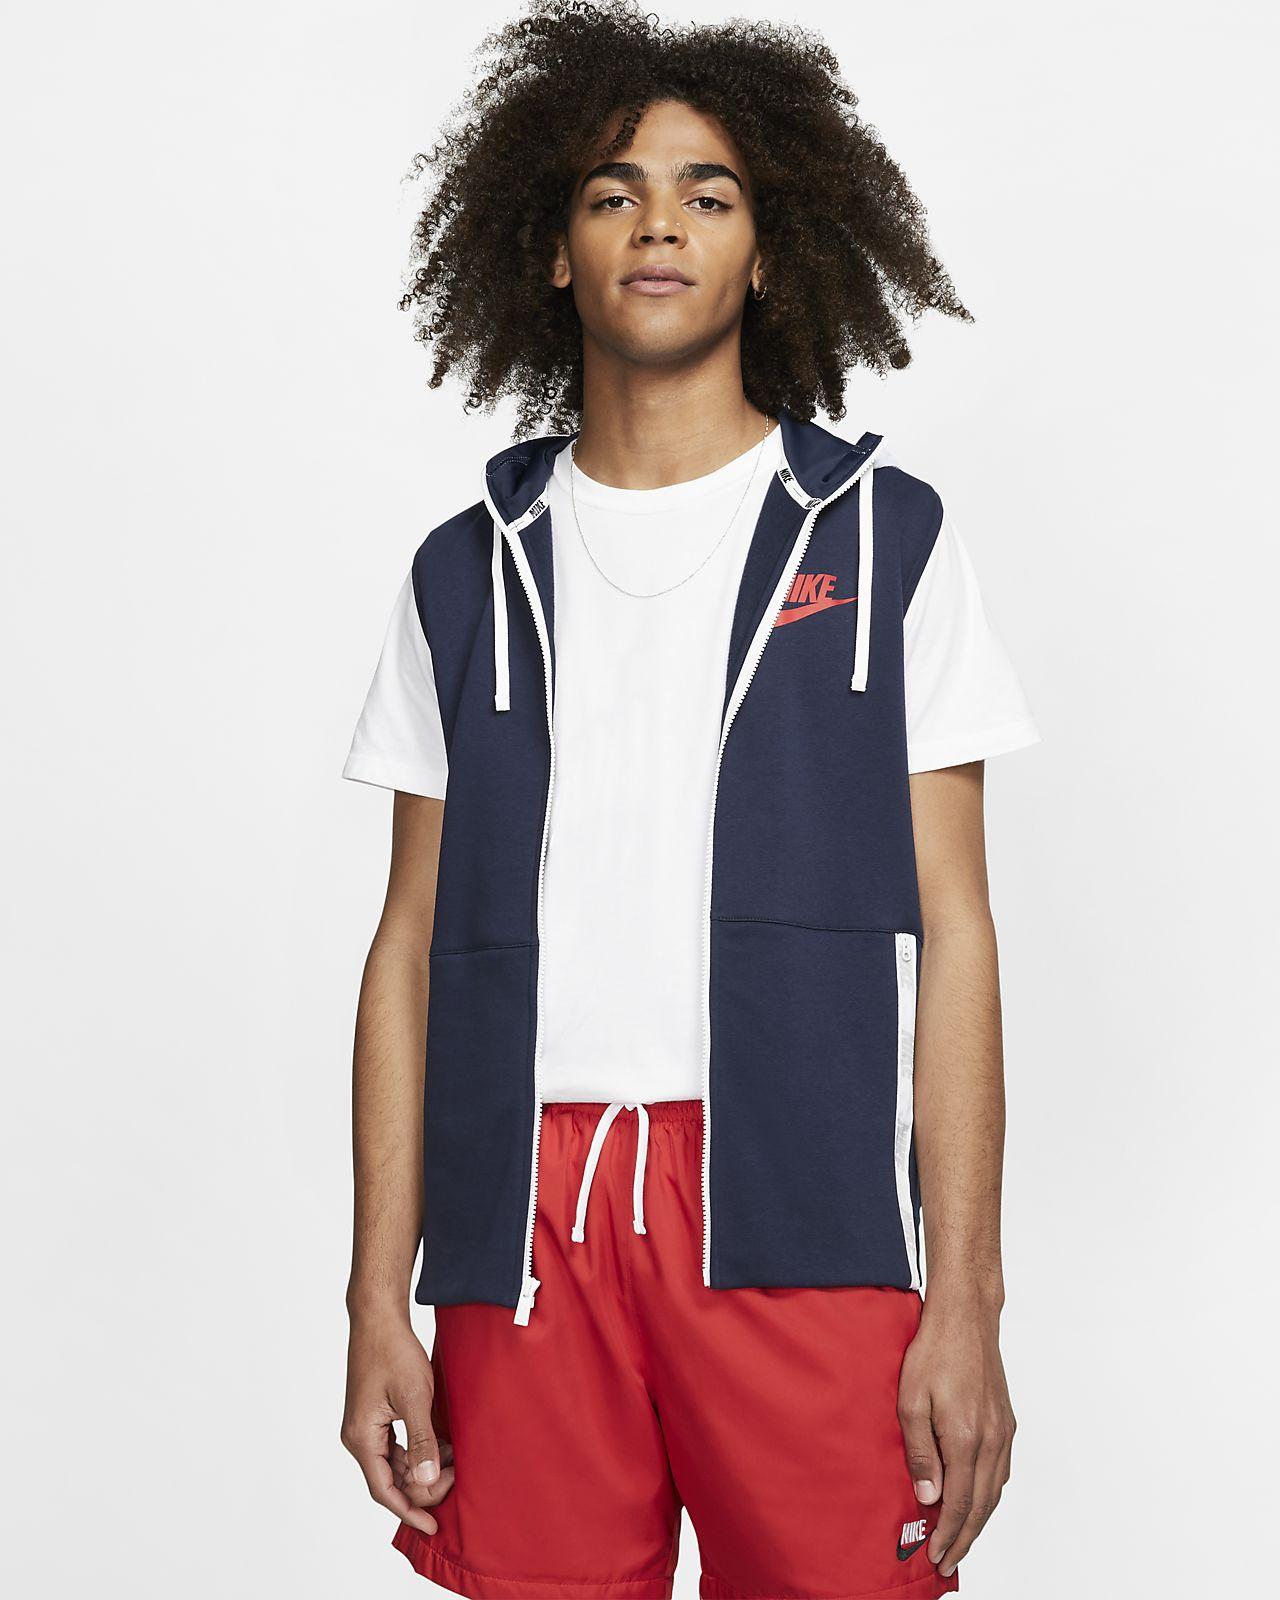 Nike Sportswear hosszú cipzáras, kapucnis férfipulóver